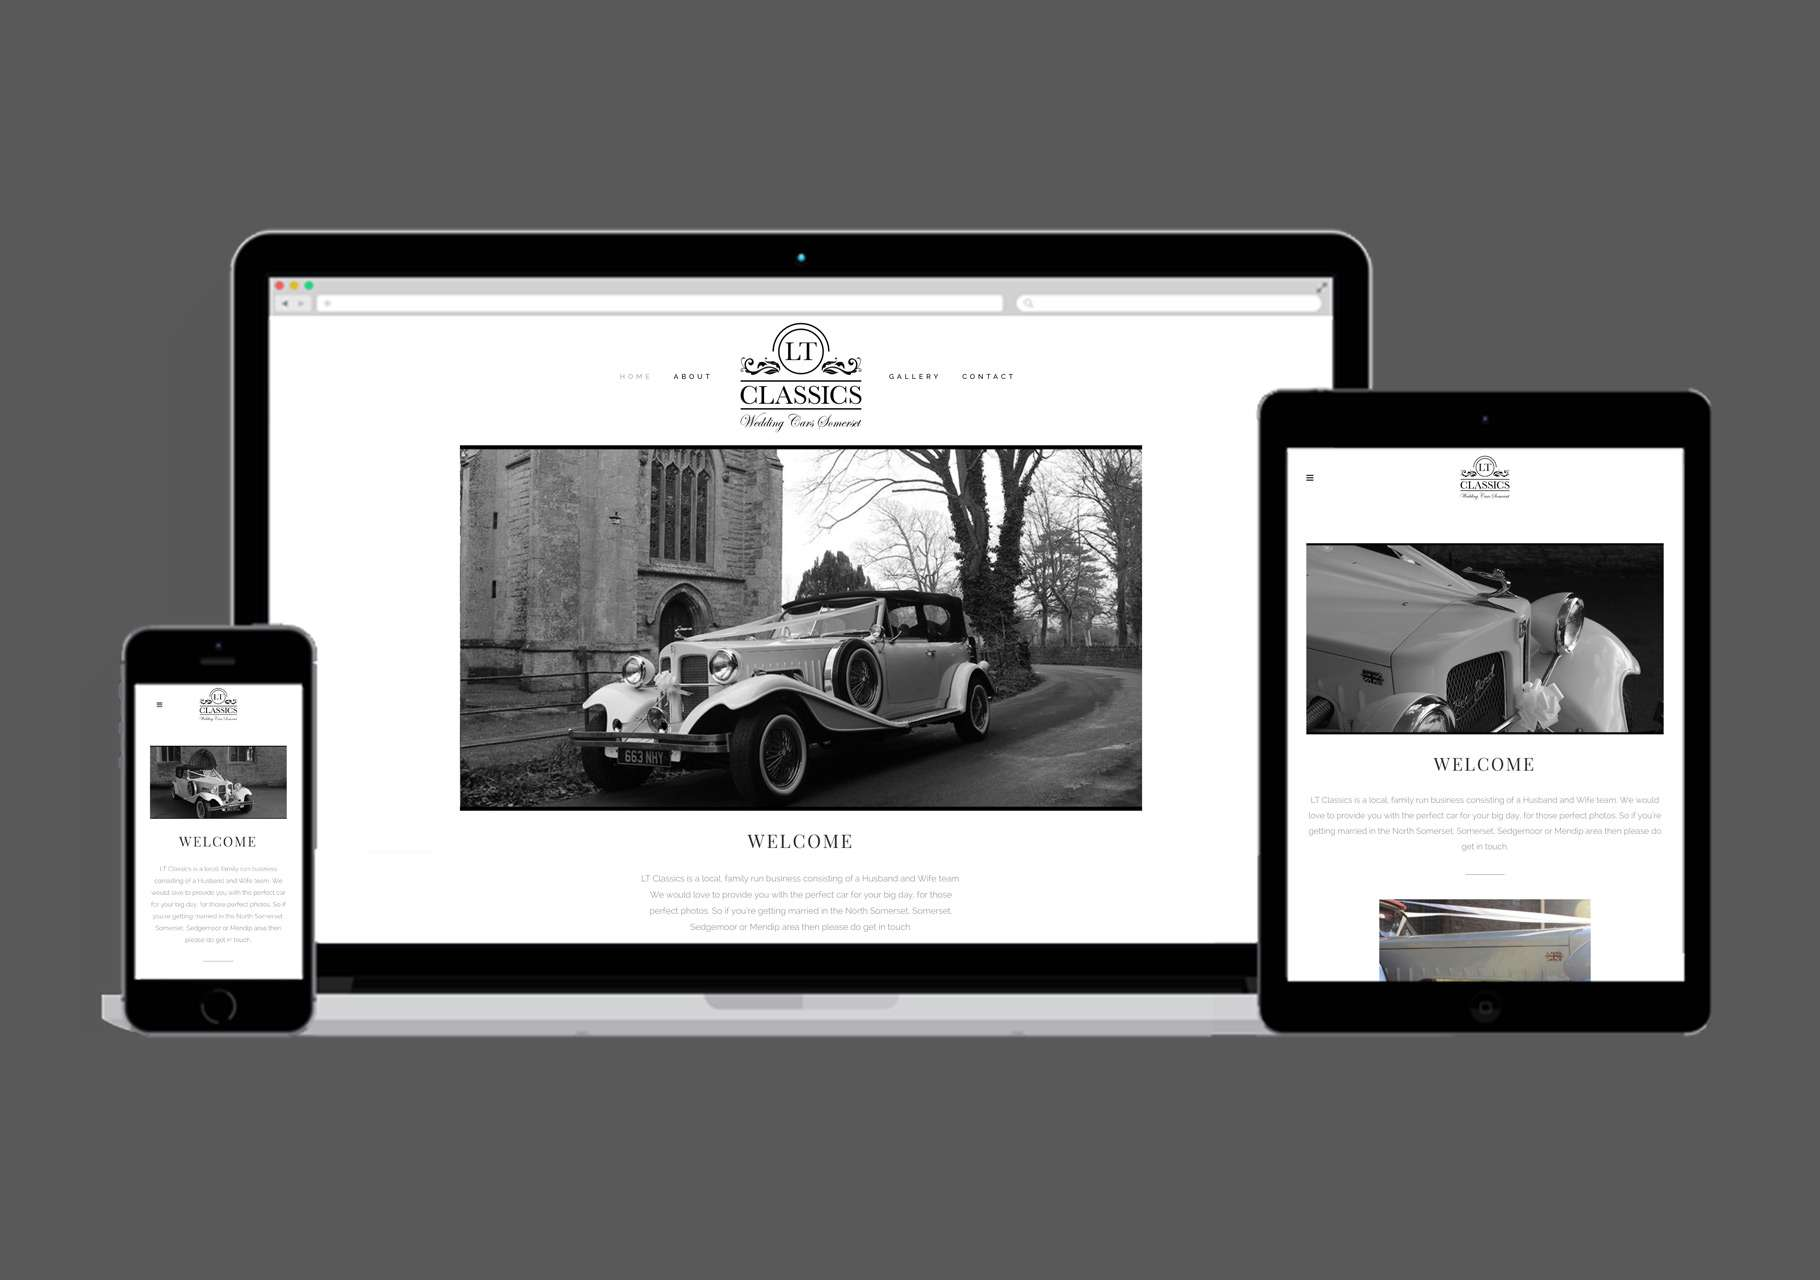 LT Classics - Wedding Cars Somerset Website Design